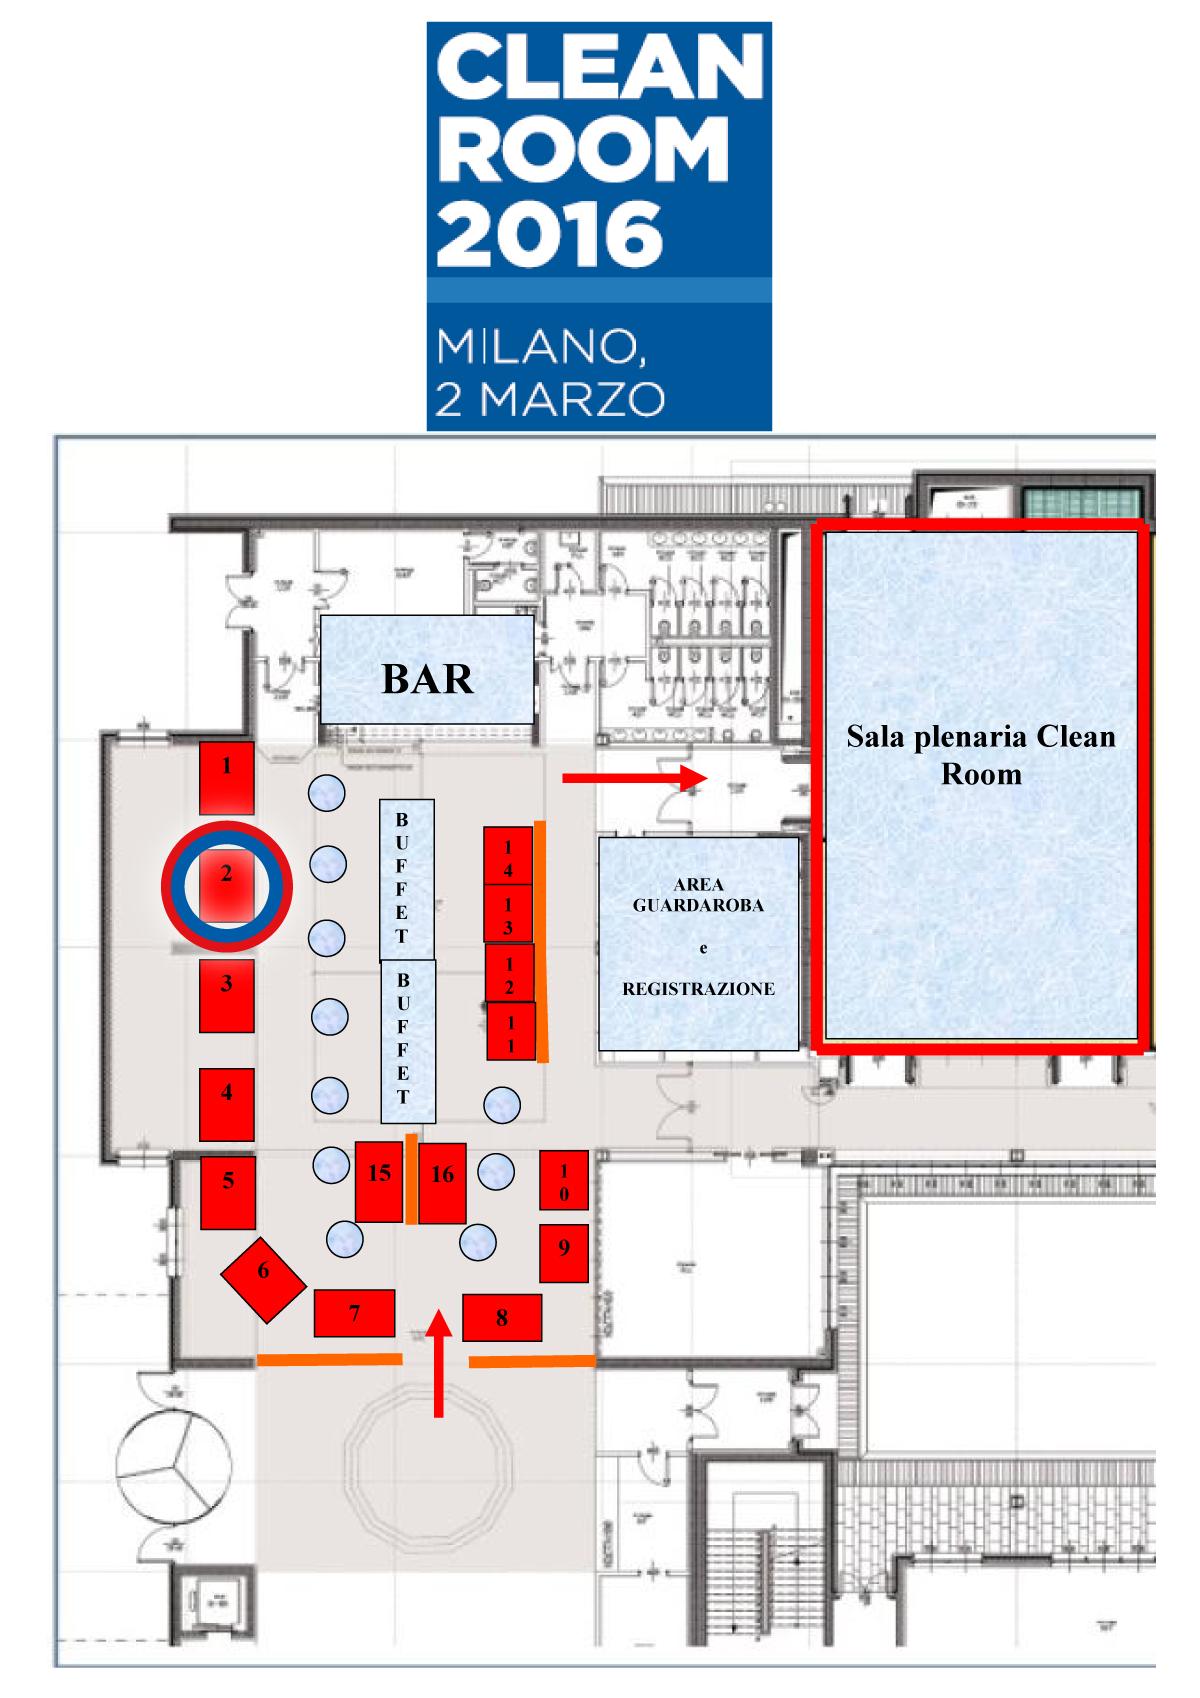 Area-Expo-Sponsor-Clean-Room-2-Marzo